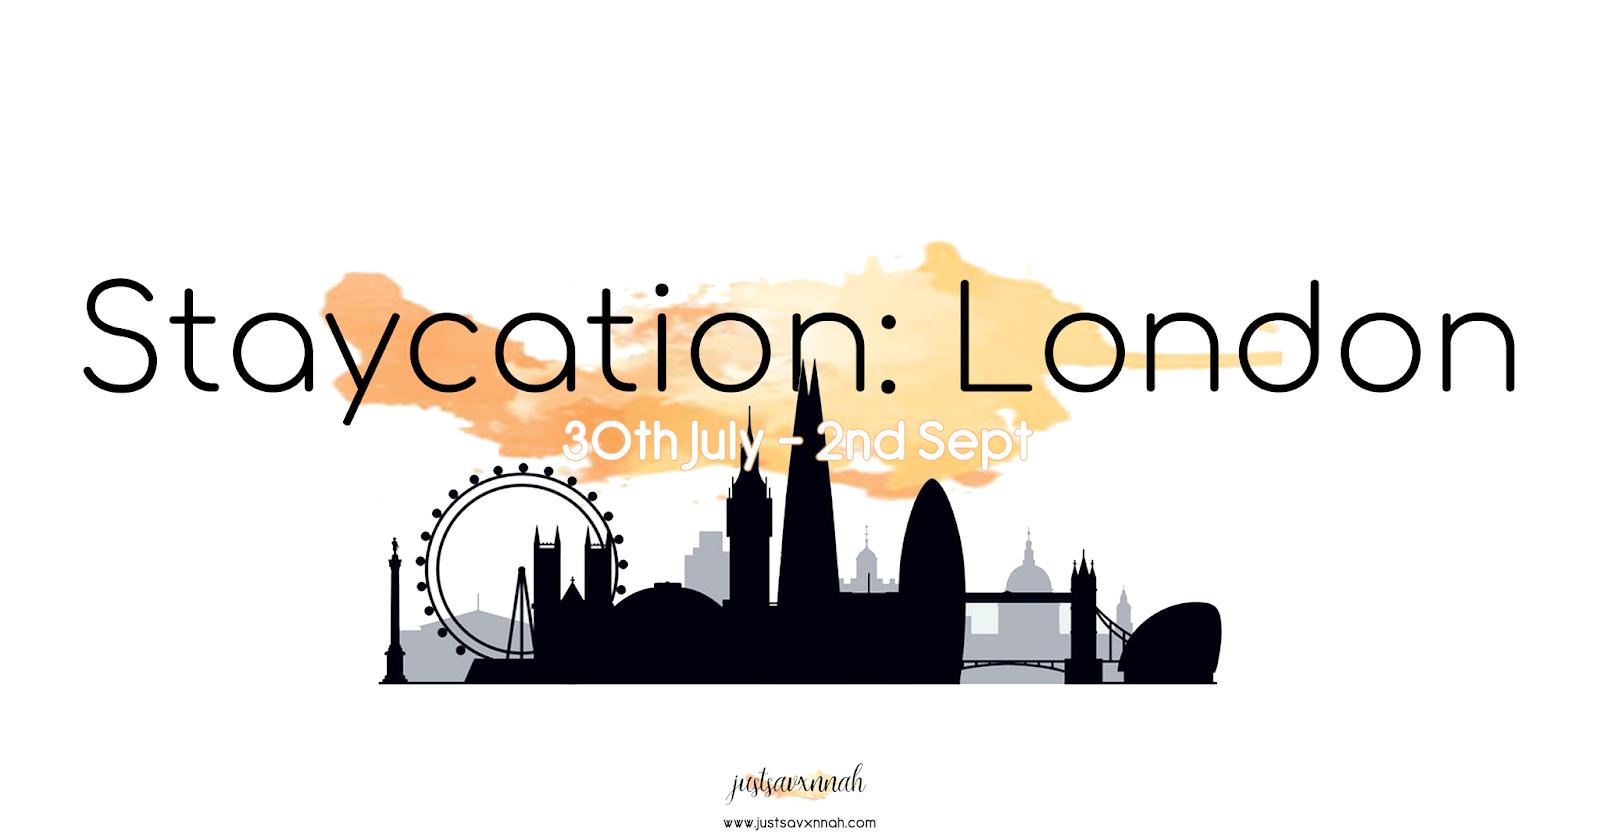 My Staycation in London